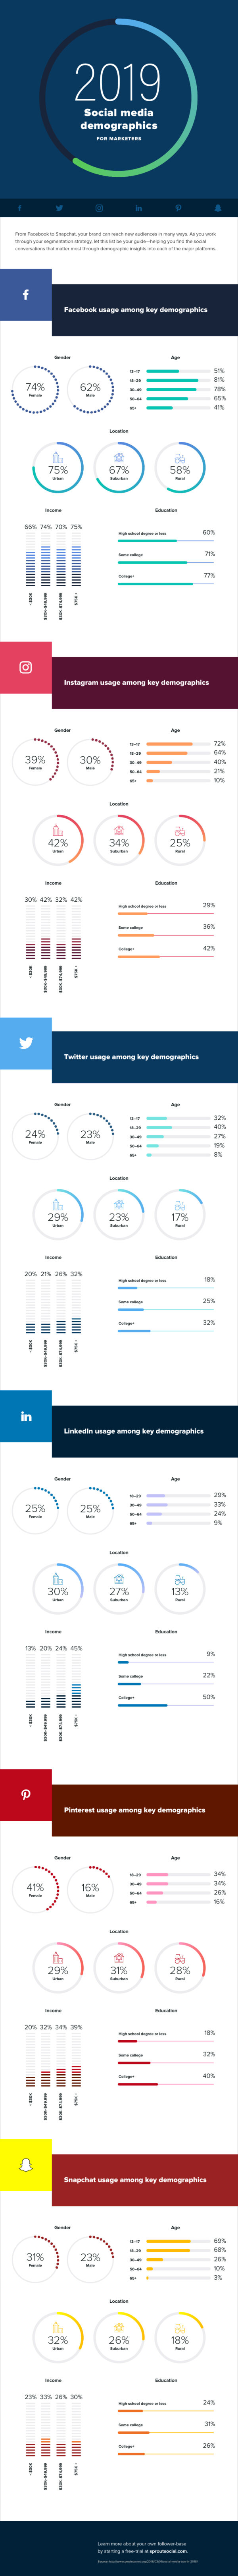 2019 Social Media Network Demographics Infographic